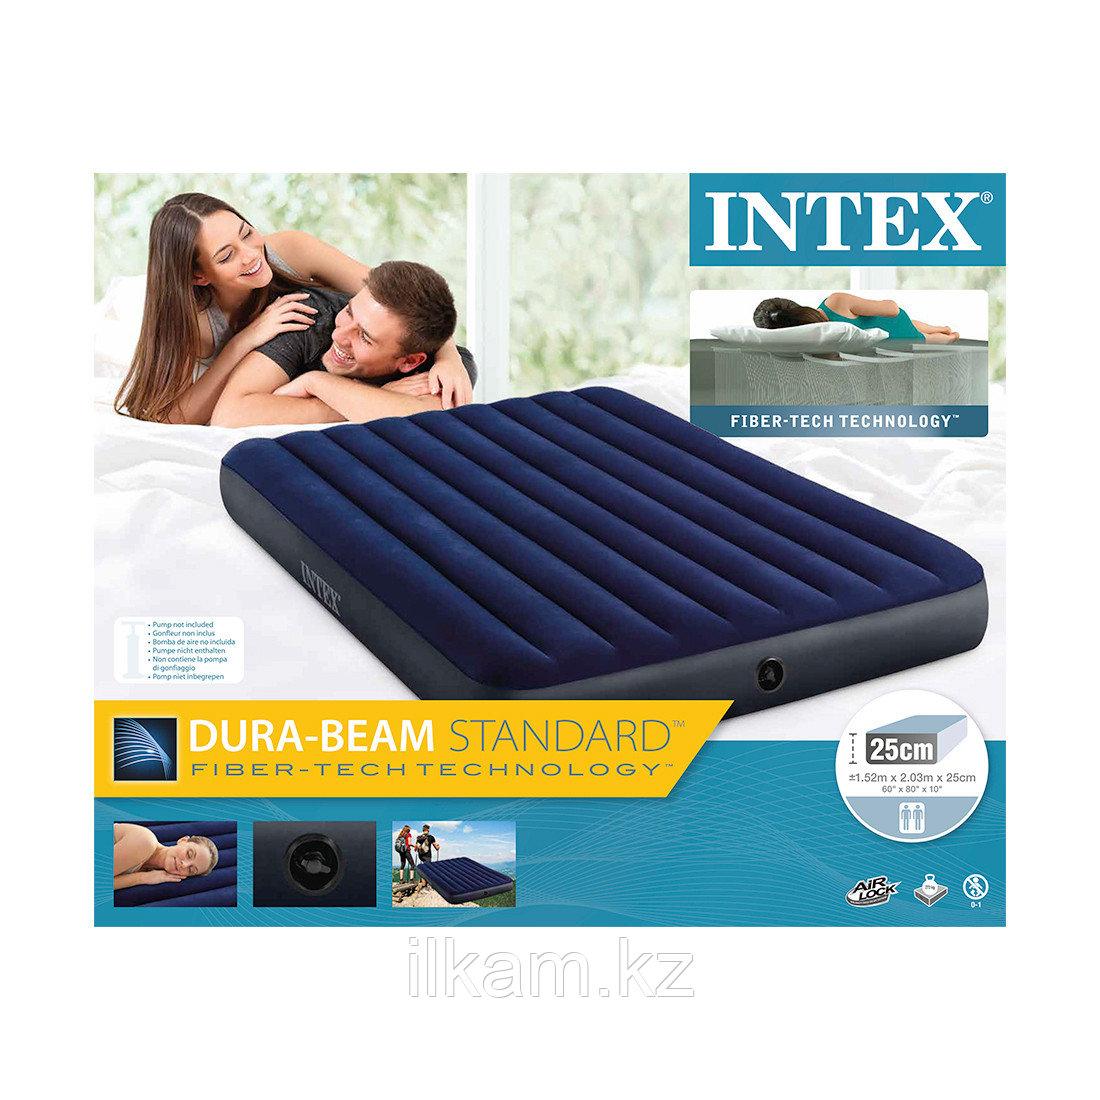 Матрас надувной, двухместный, Intex  203 х 152 х 25 см